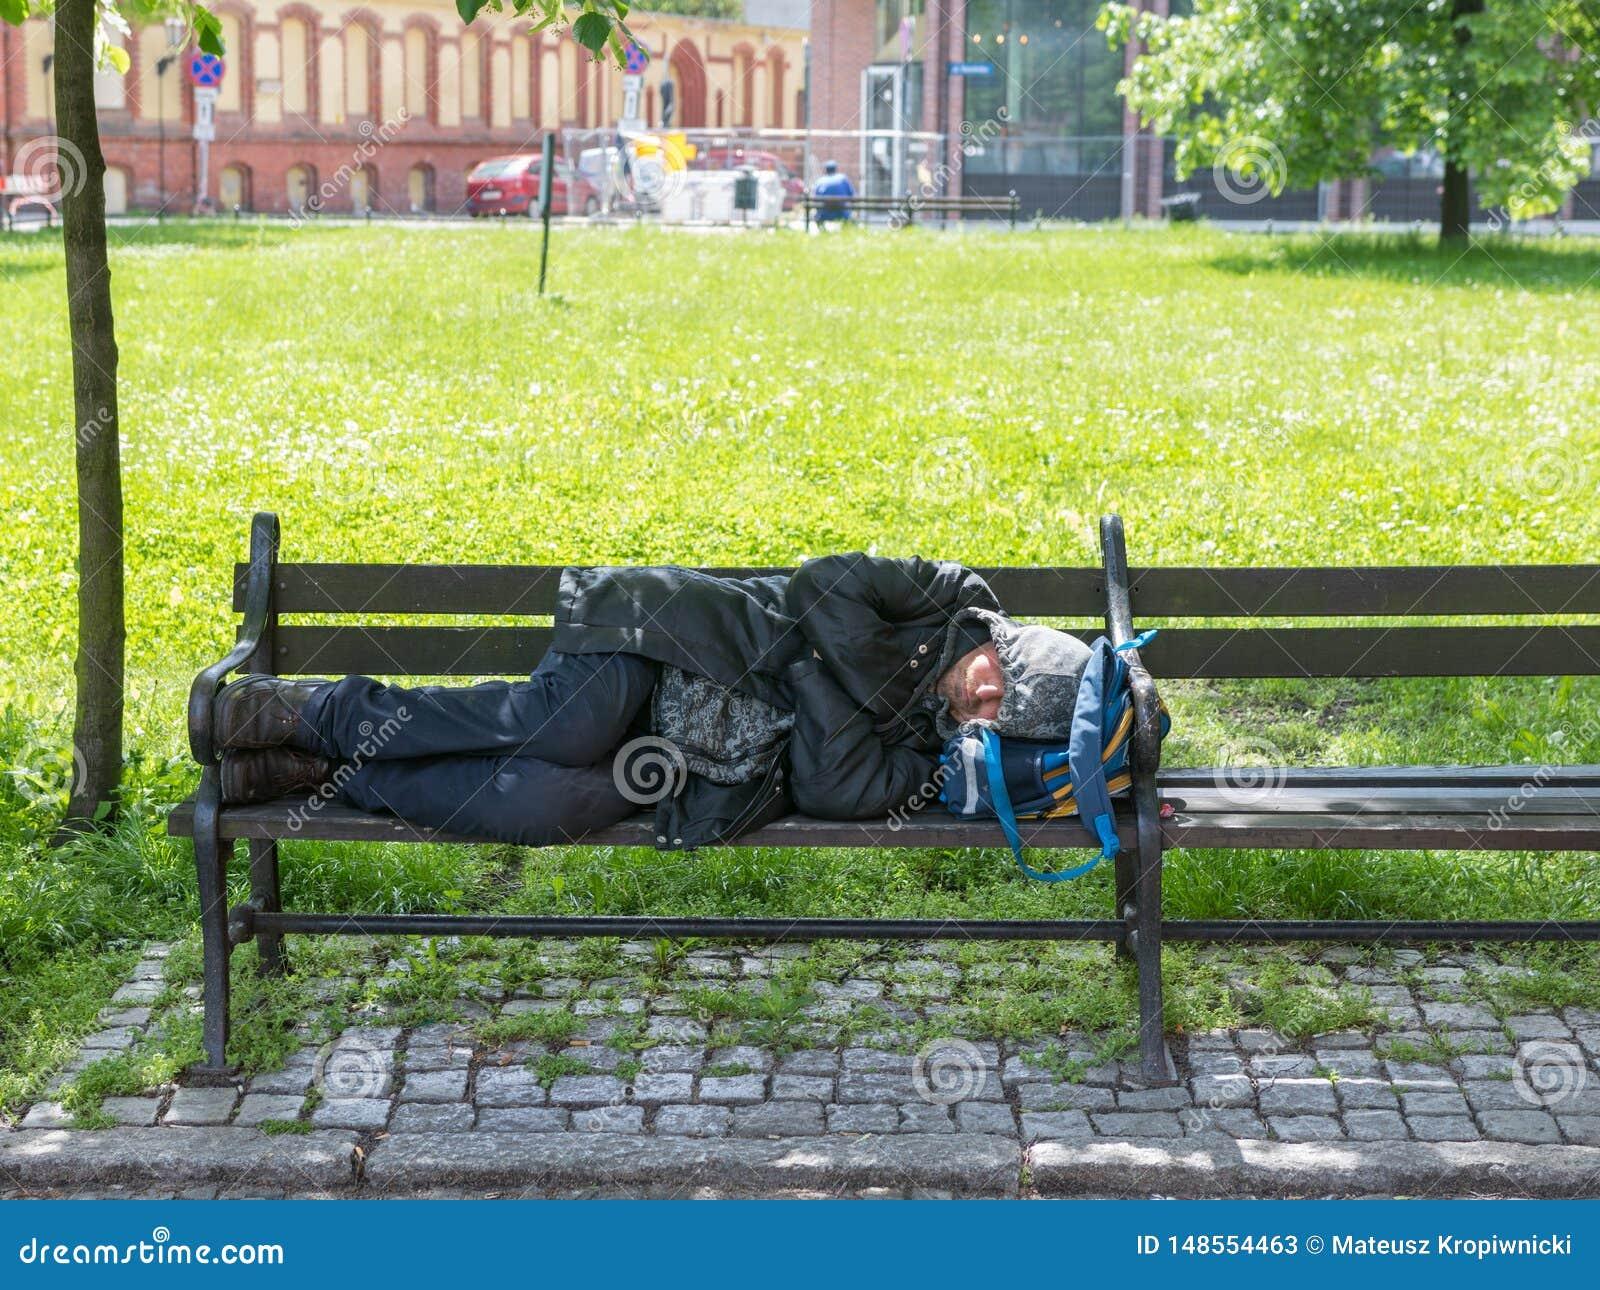 Wrocław, Poland - May 24 2019: Homeless man is sleeping on a bench near a newly built